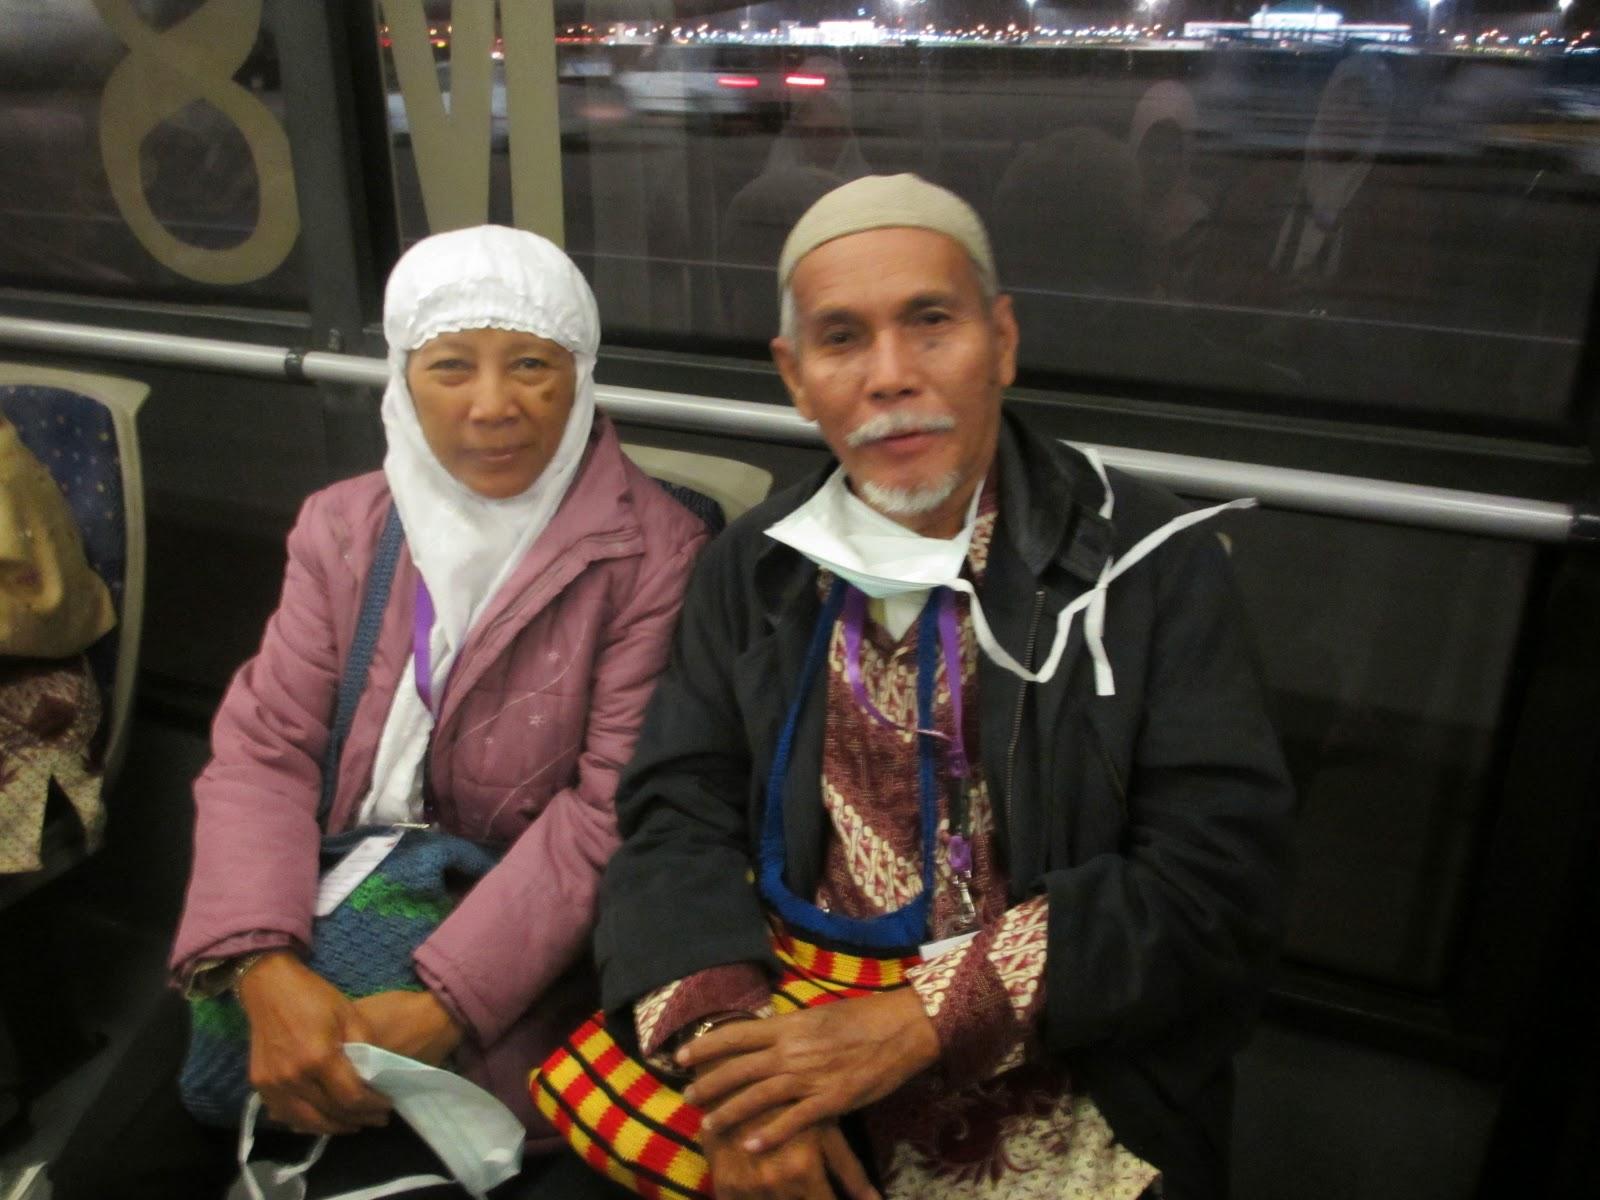 Biaya Umroh 2014 Bersama Travel Umroh Bandung Satutours